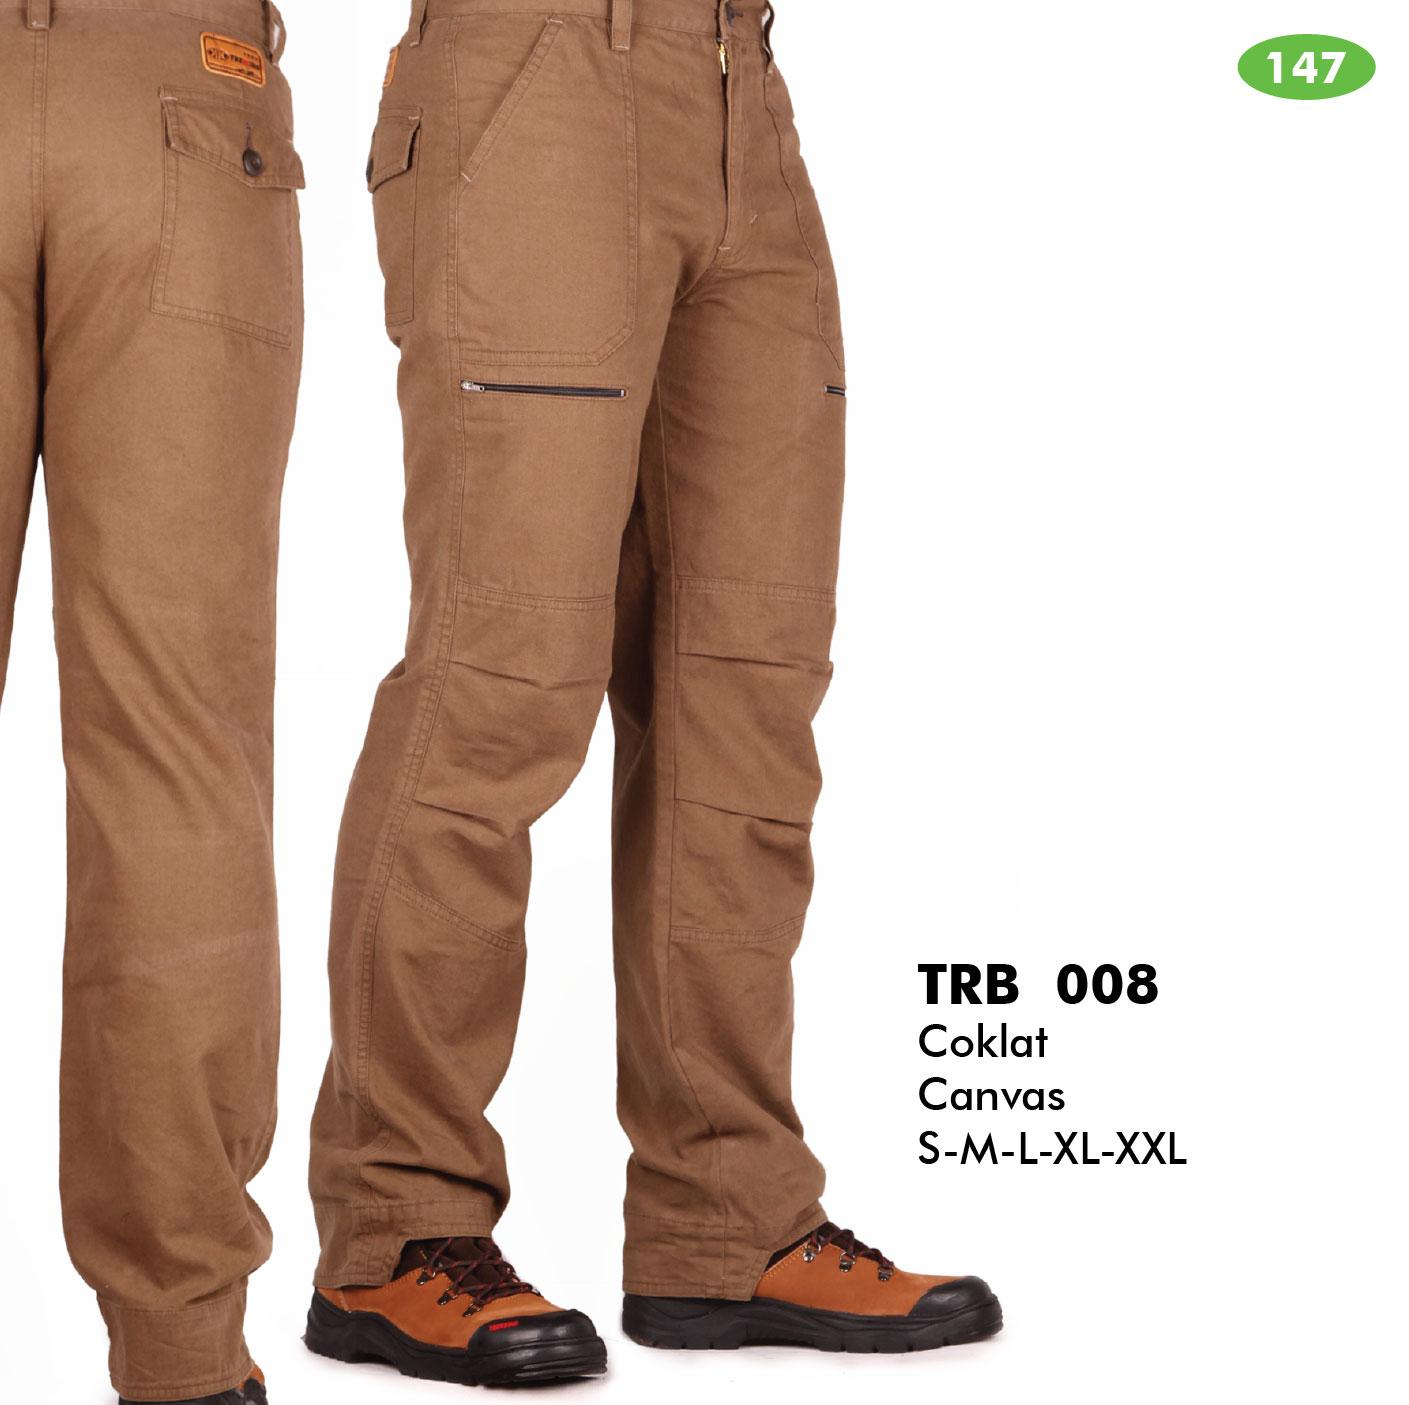 Ezplora Stylish Adventure Cargo Long Pants Celana Panjang Outdoor Black Yak Original Pant Quickdry Ori Gunung Jual Pdl